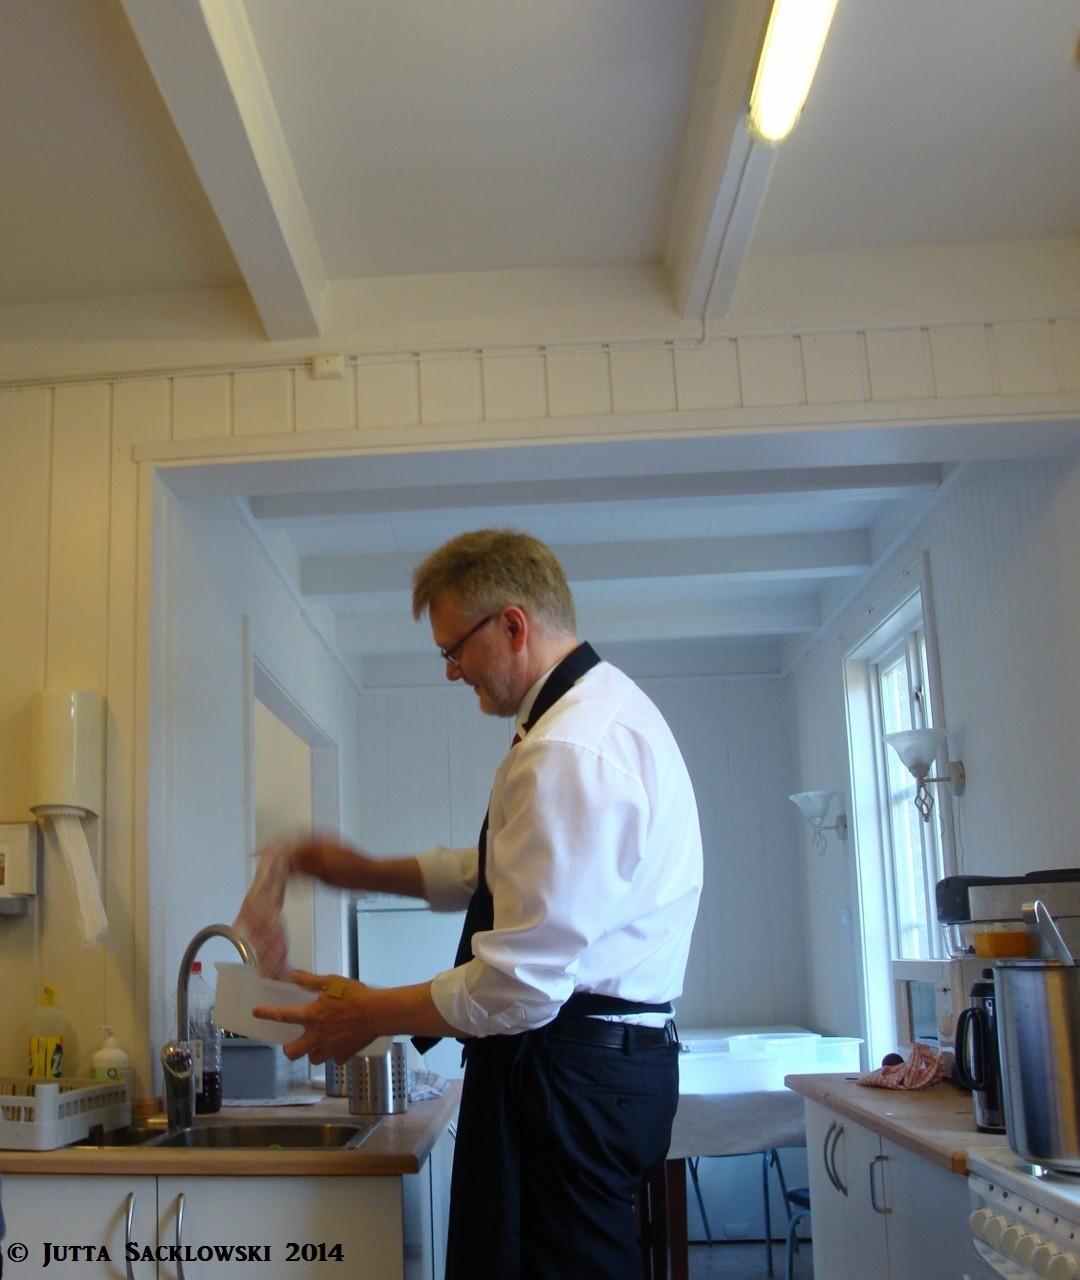 Asbjørn als Tellerwäscher